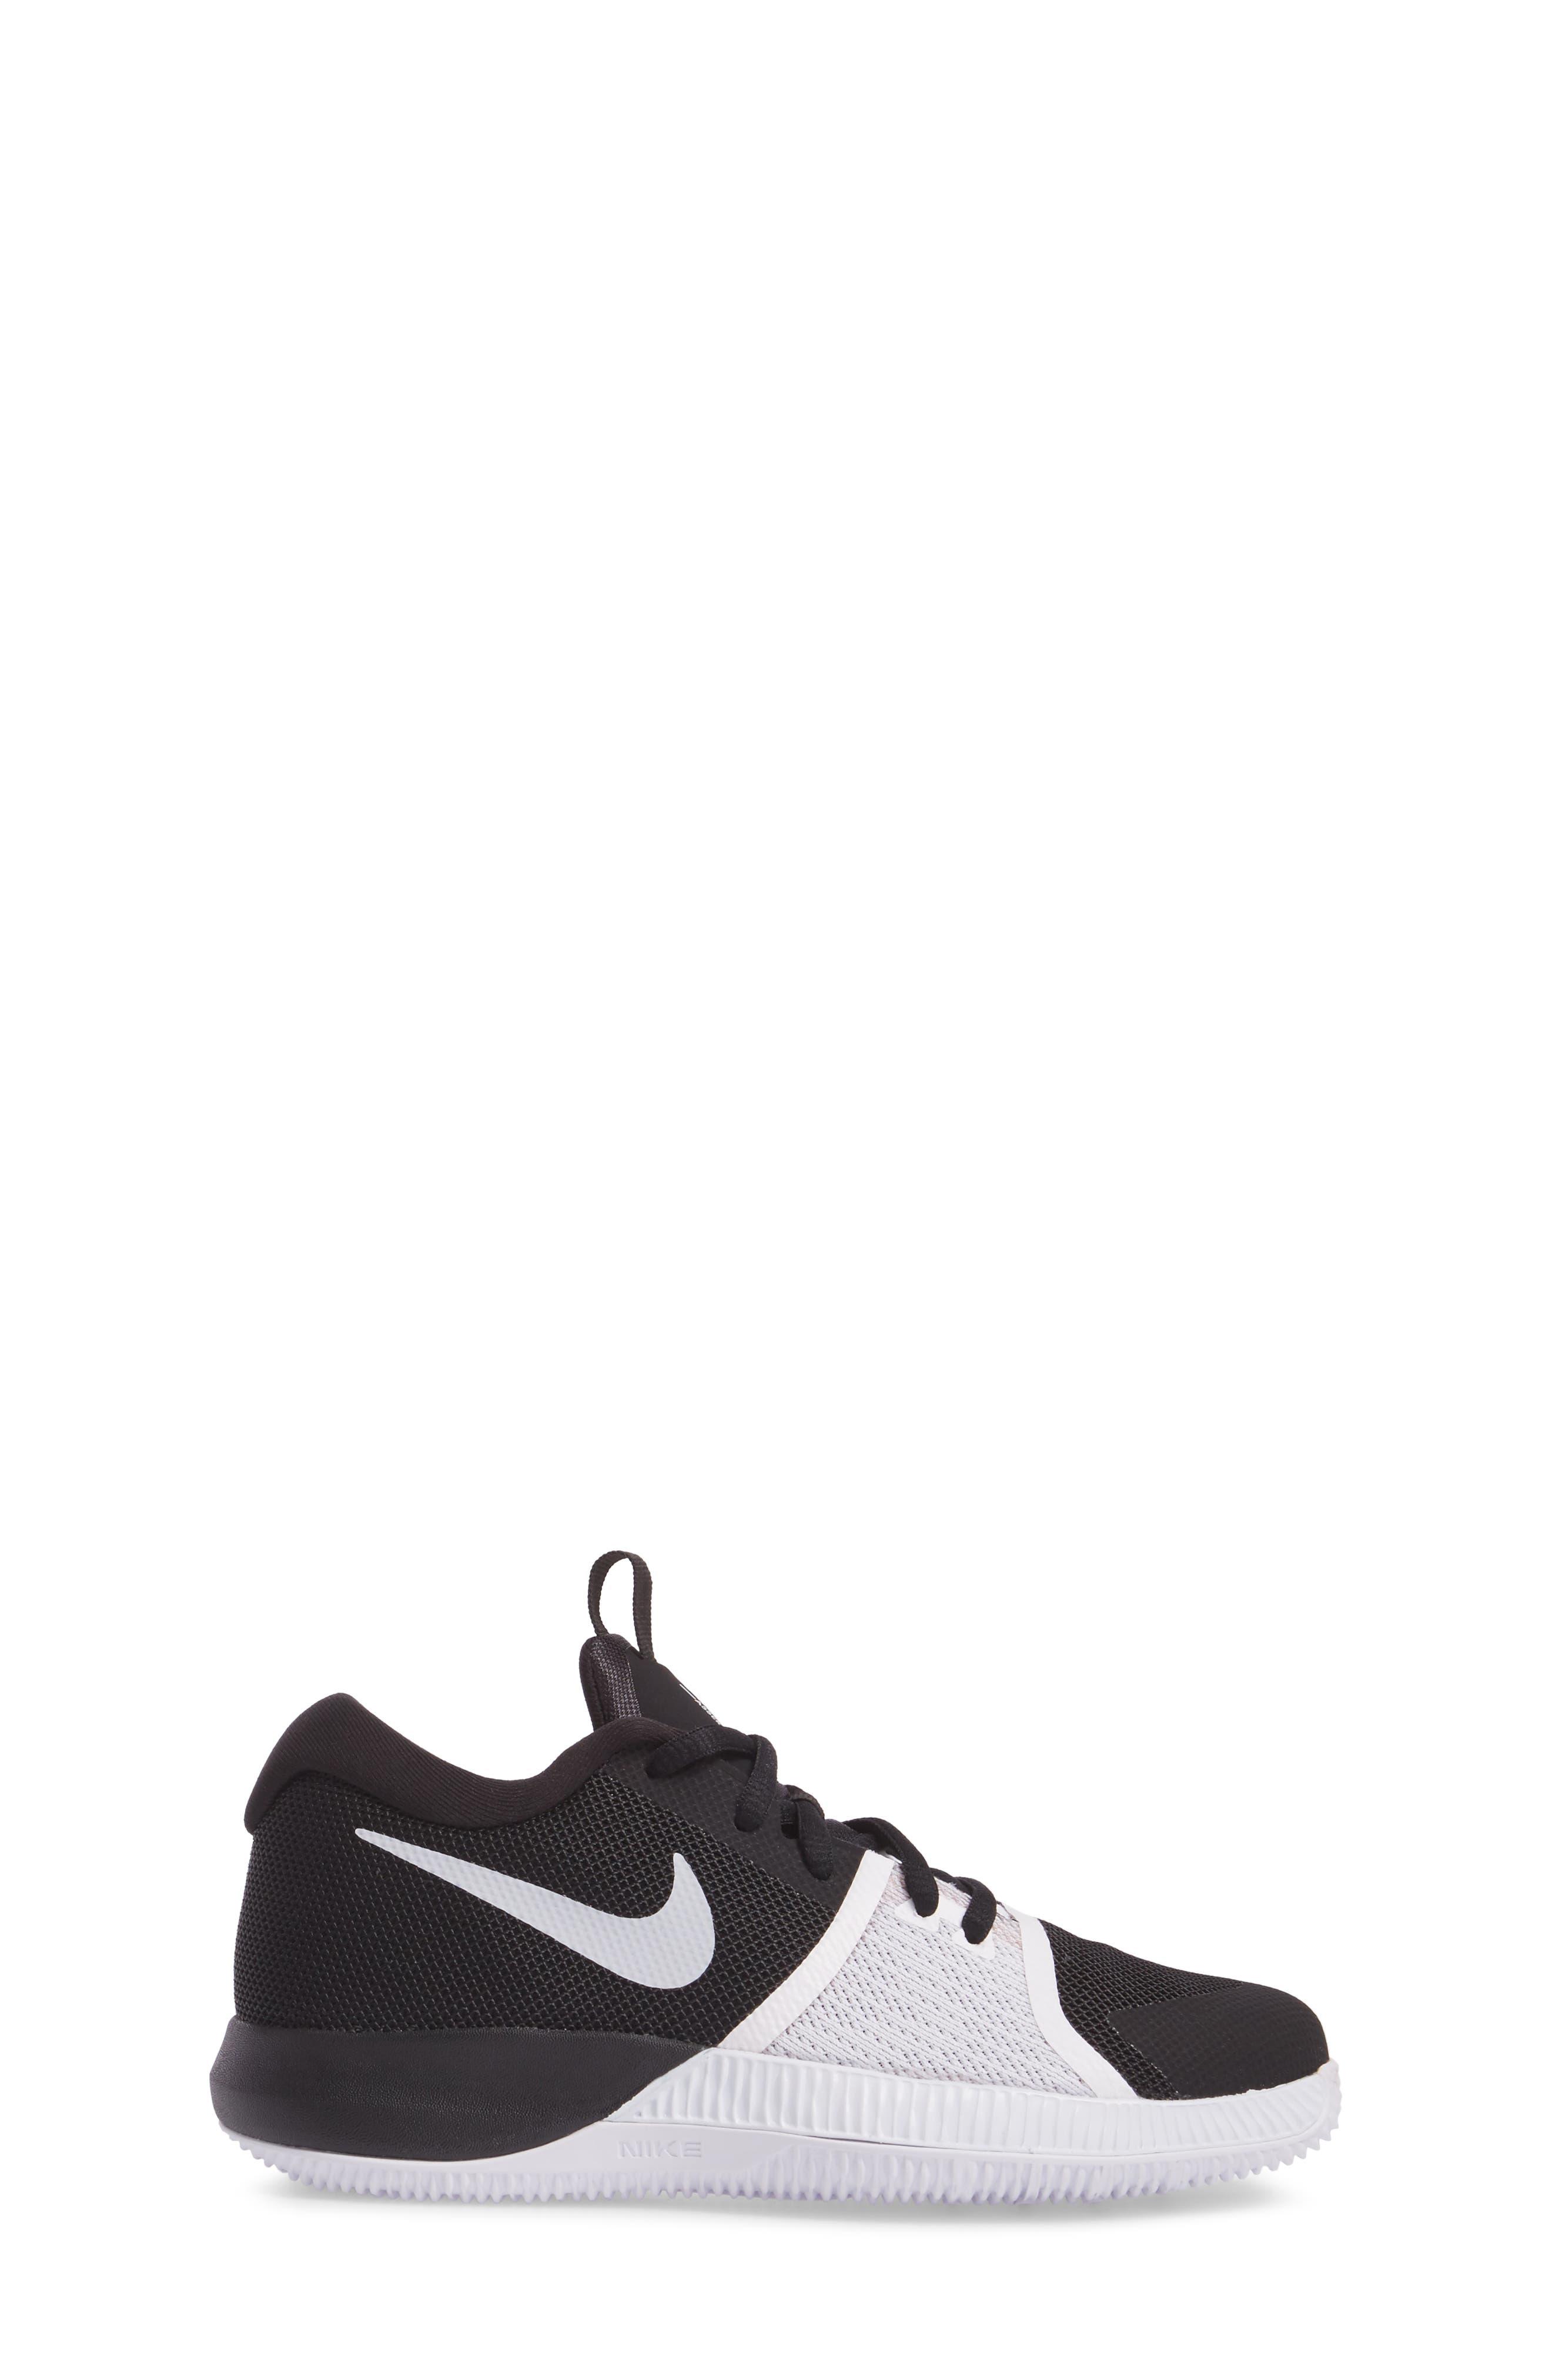 Assersion Sneaker,                             Alternate thumbnail 3, color,                             005